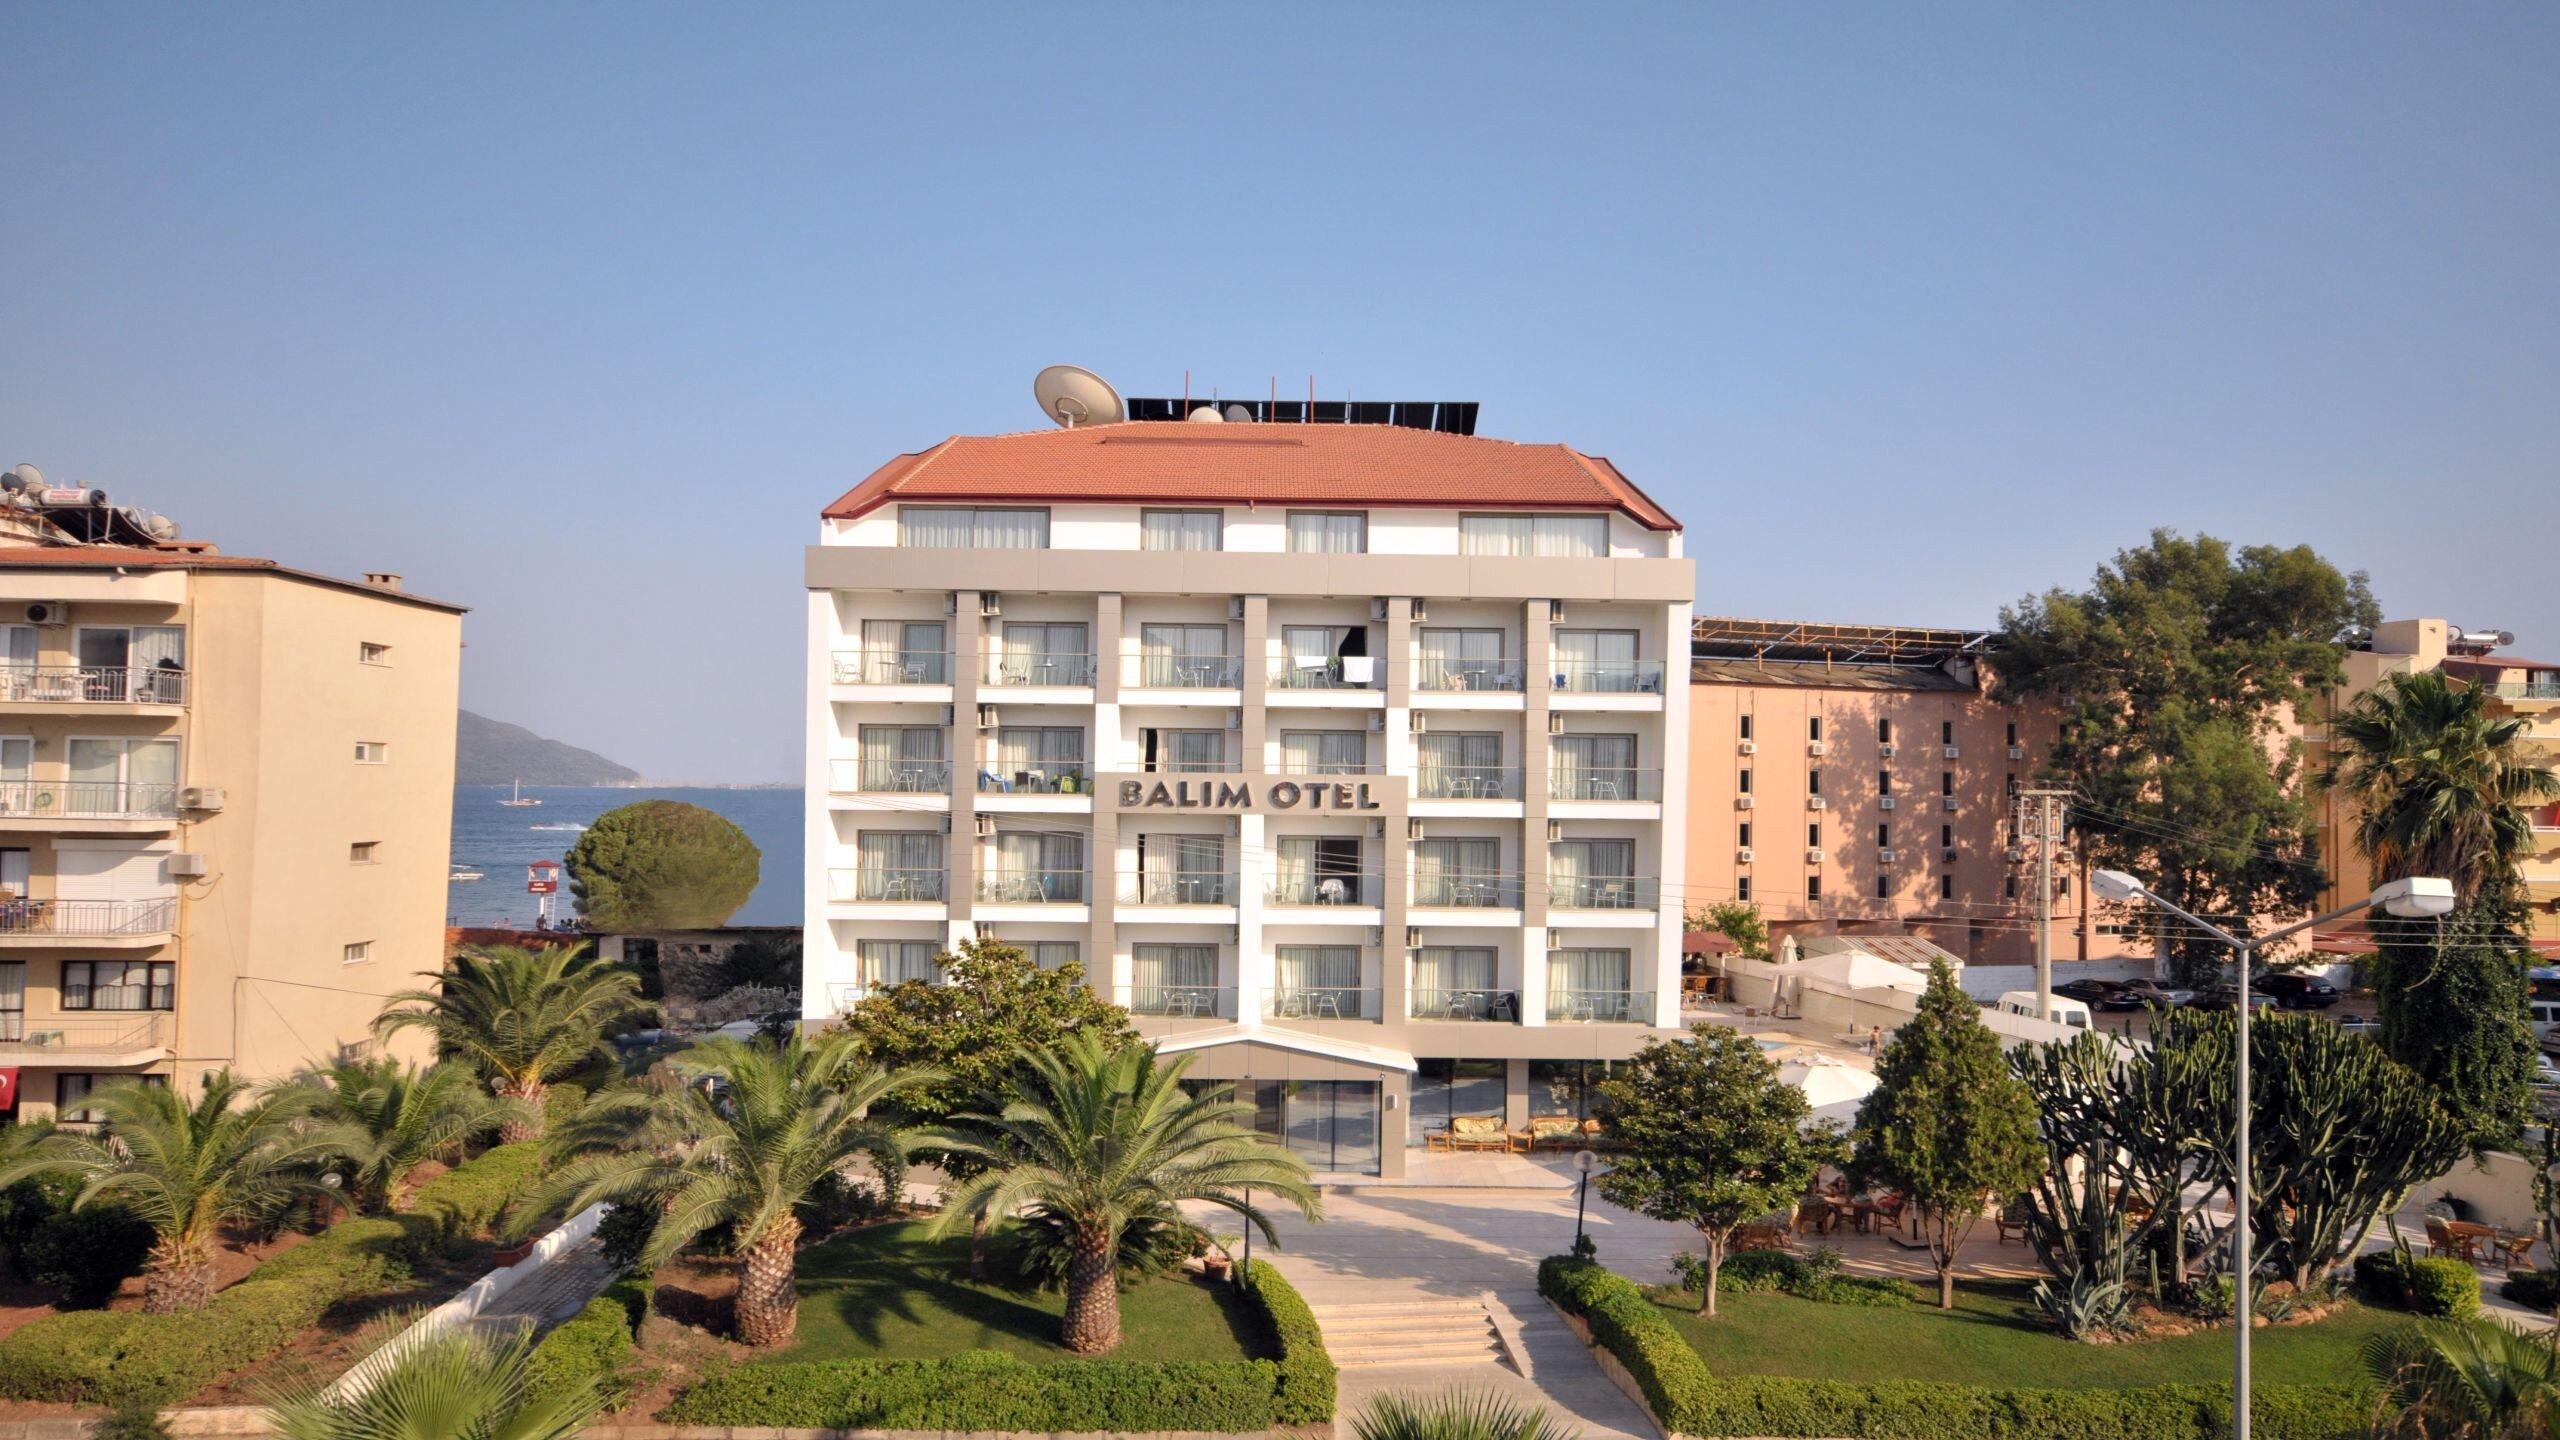 Balım Otel